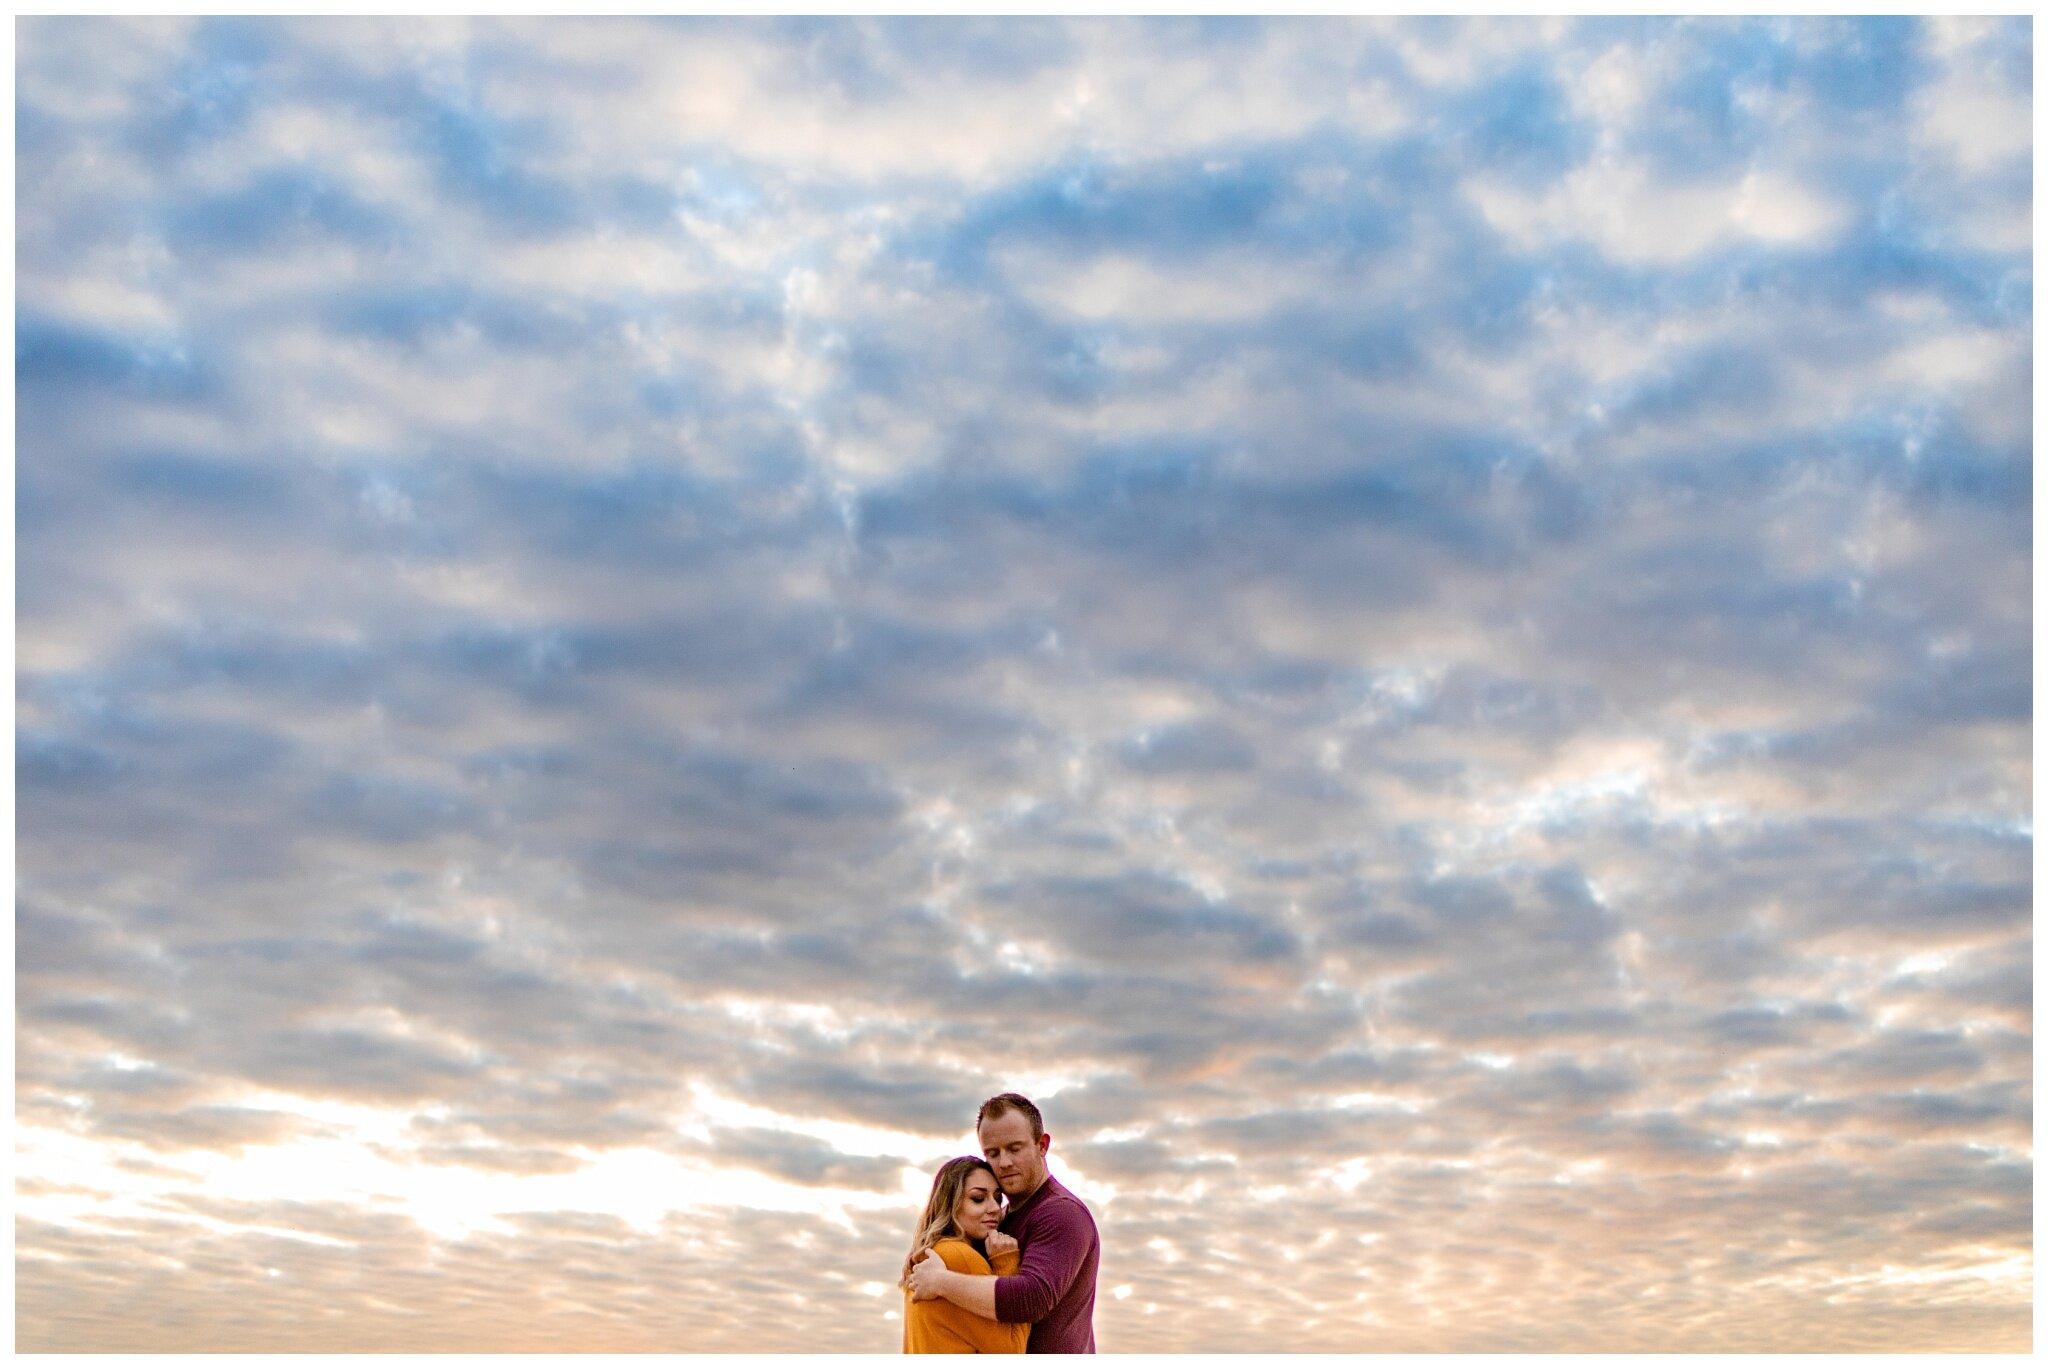 Edmonton Engagement Photographer Romantic Couples Photos Local YEG Strathcona County_0013.jpg